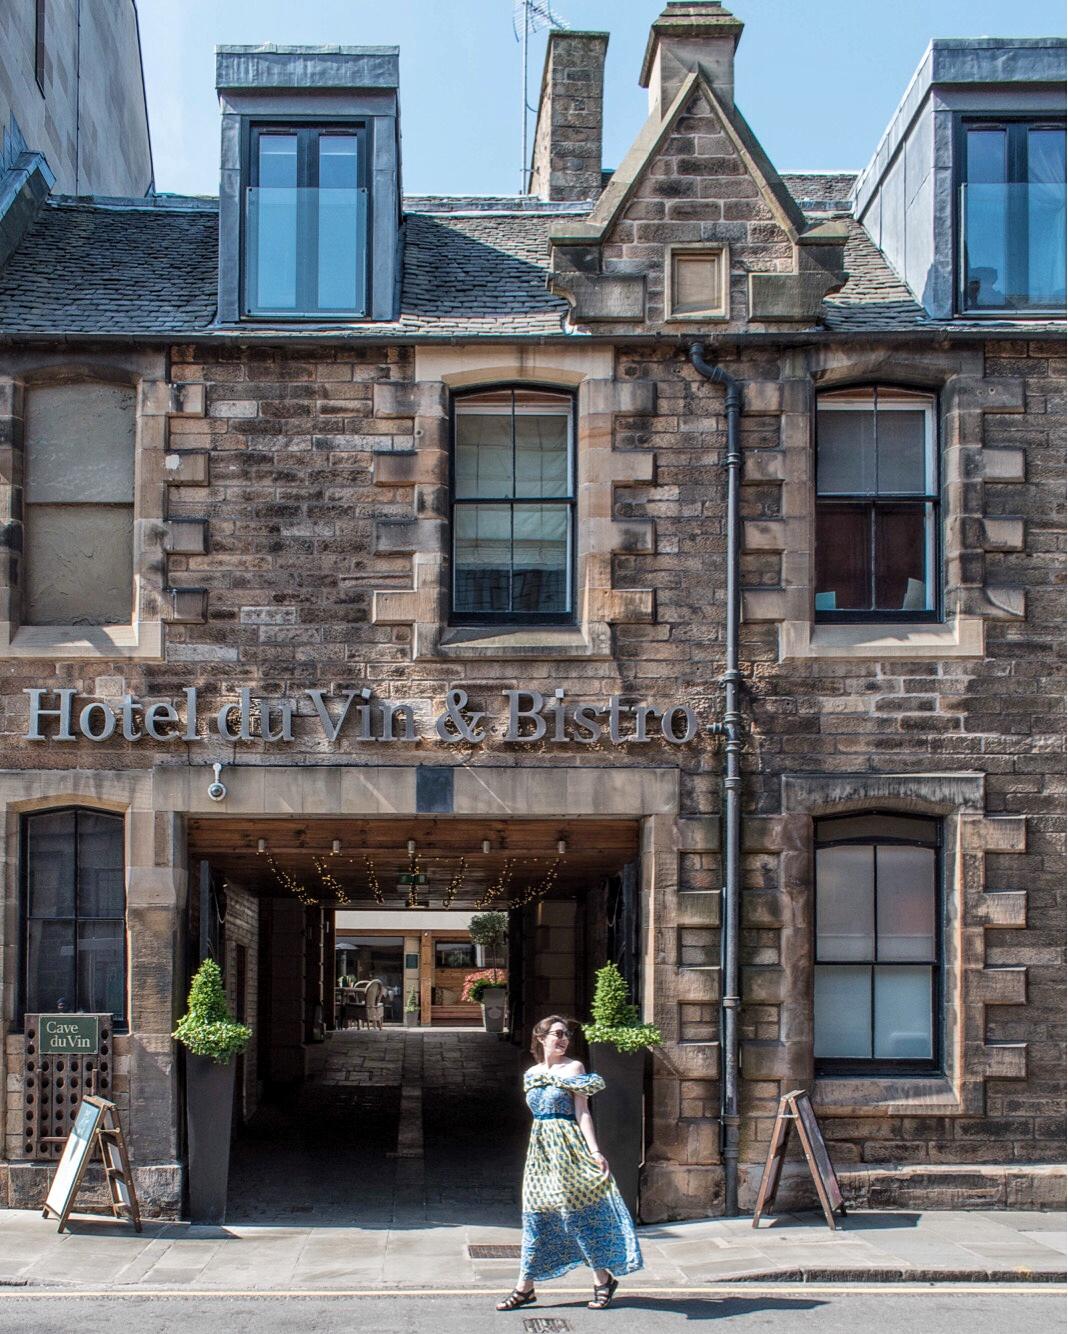 HOTEL DU VIN: HISTORIC BOUTIQUE IN OLD TOWN EDINBURGH